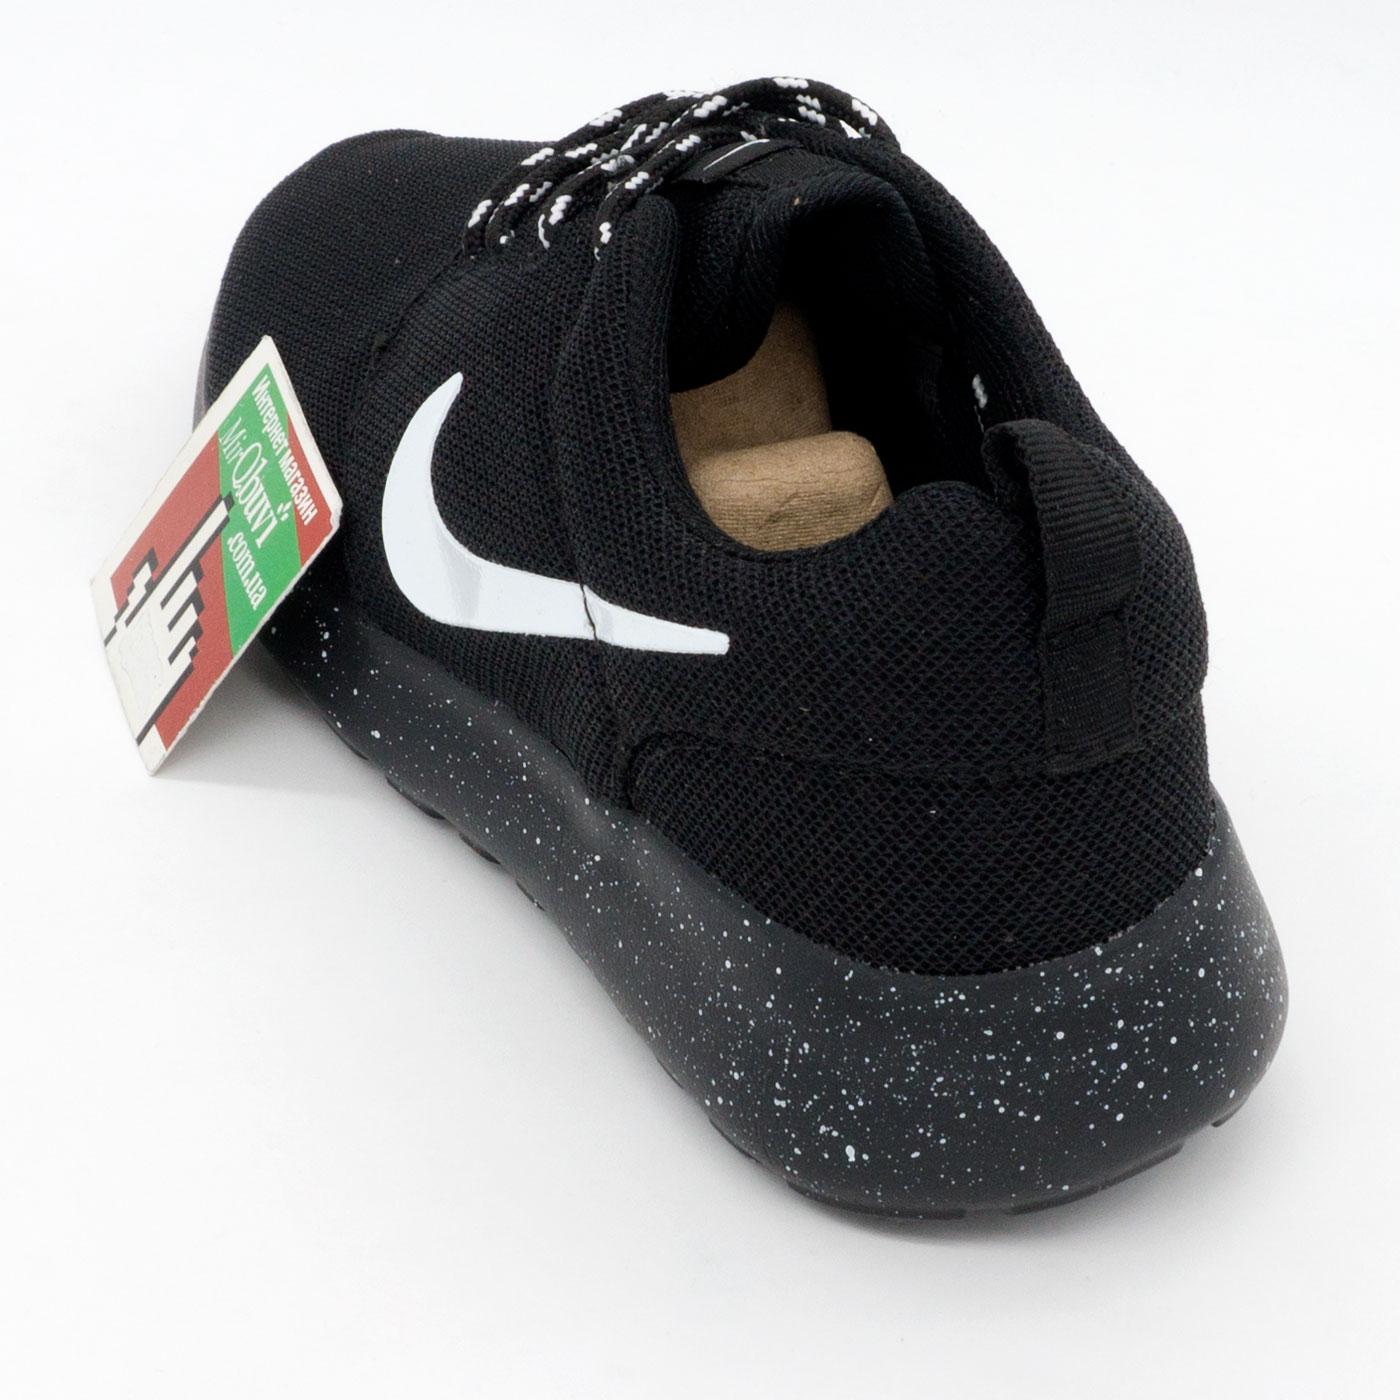 фото back Nike Roshe Run полностью черные в крапинку. Топ качество!!! back